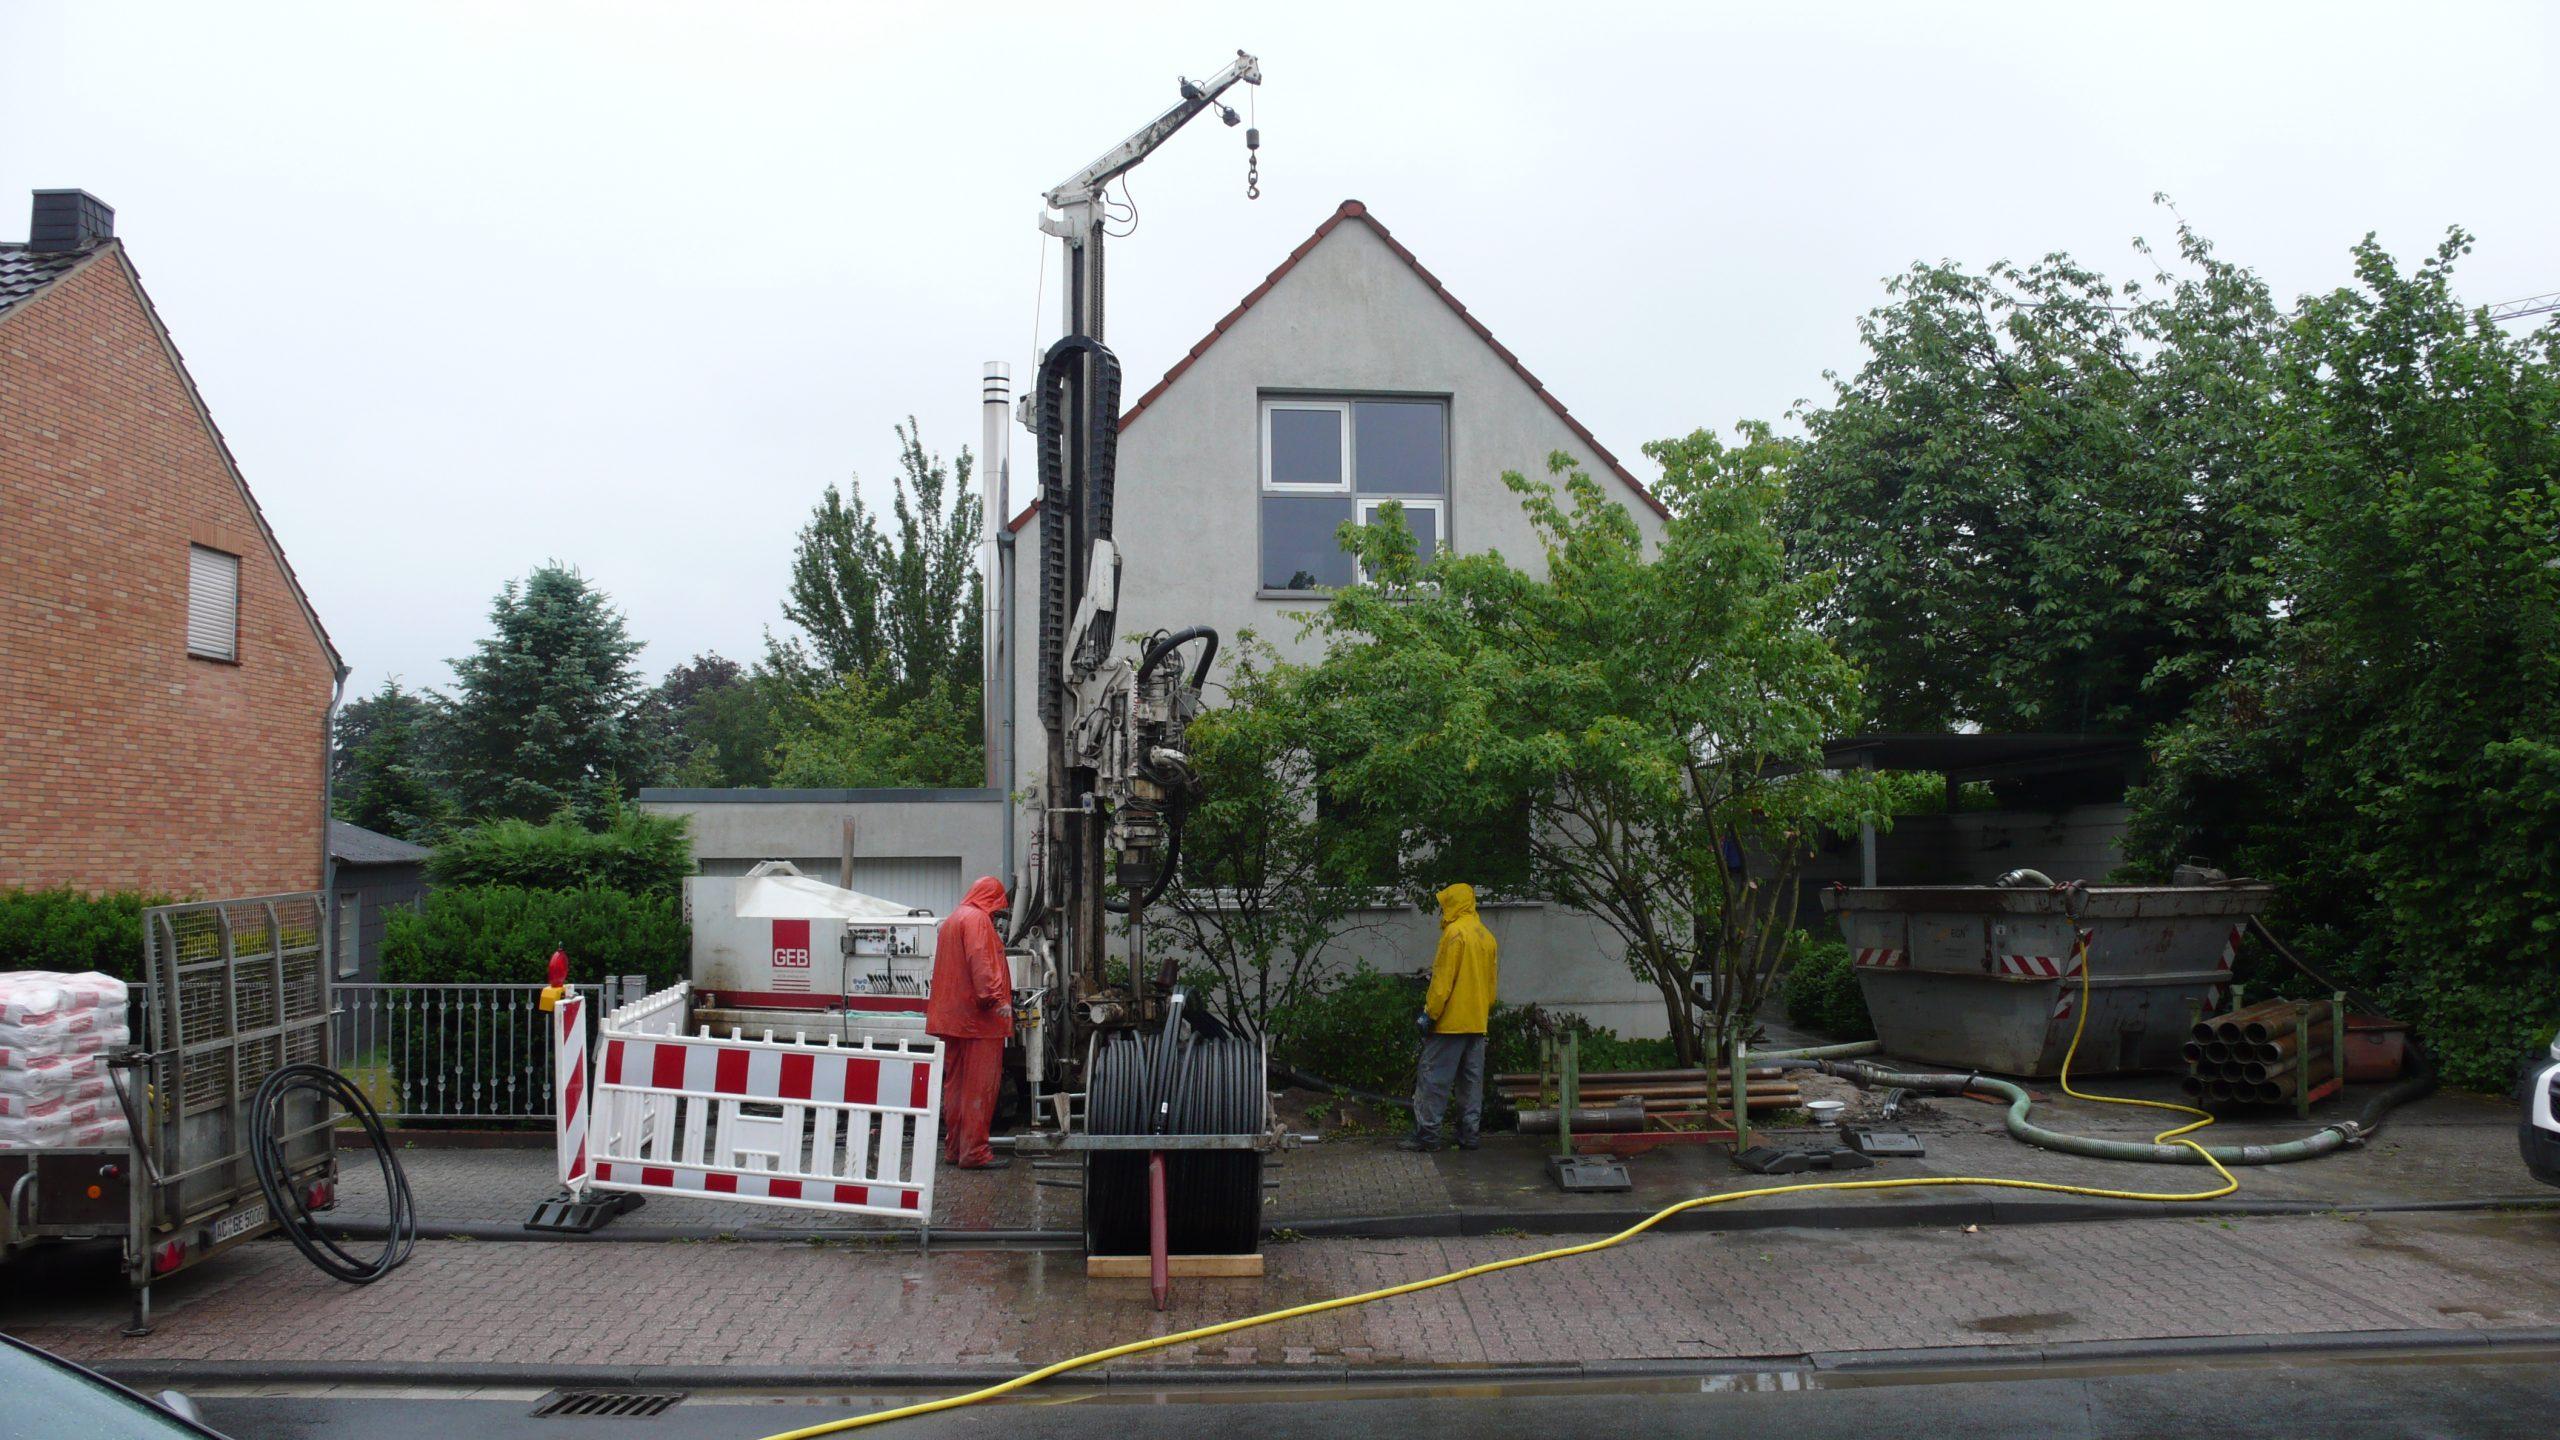 Geothermie im Altbau - Einfamilienhäuser